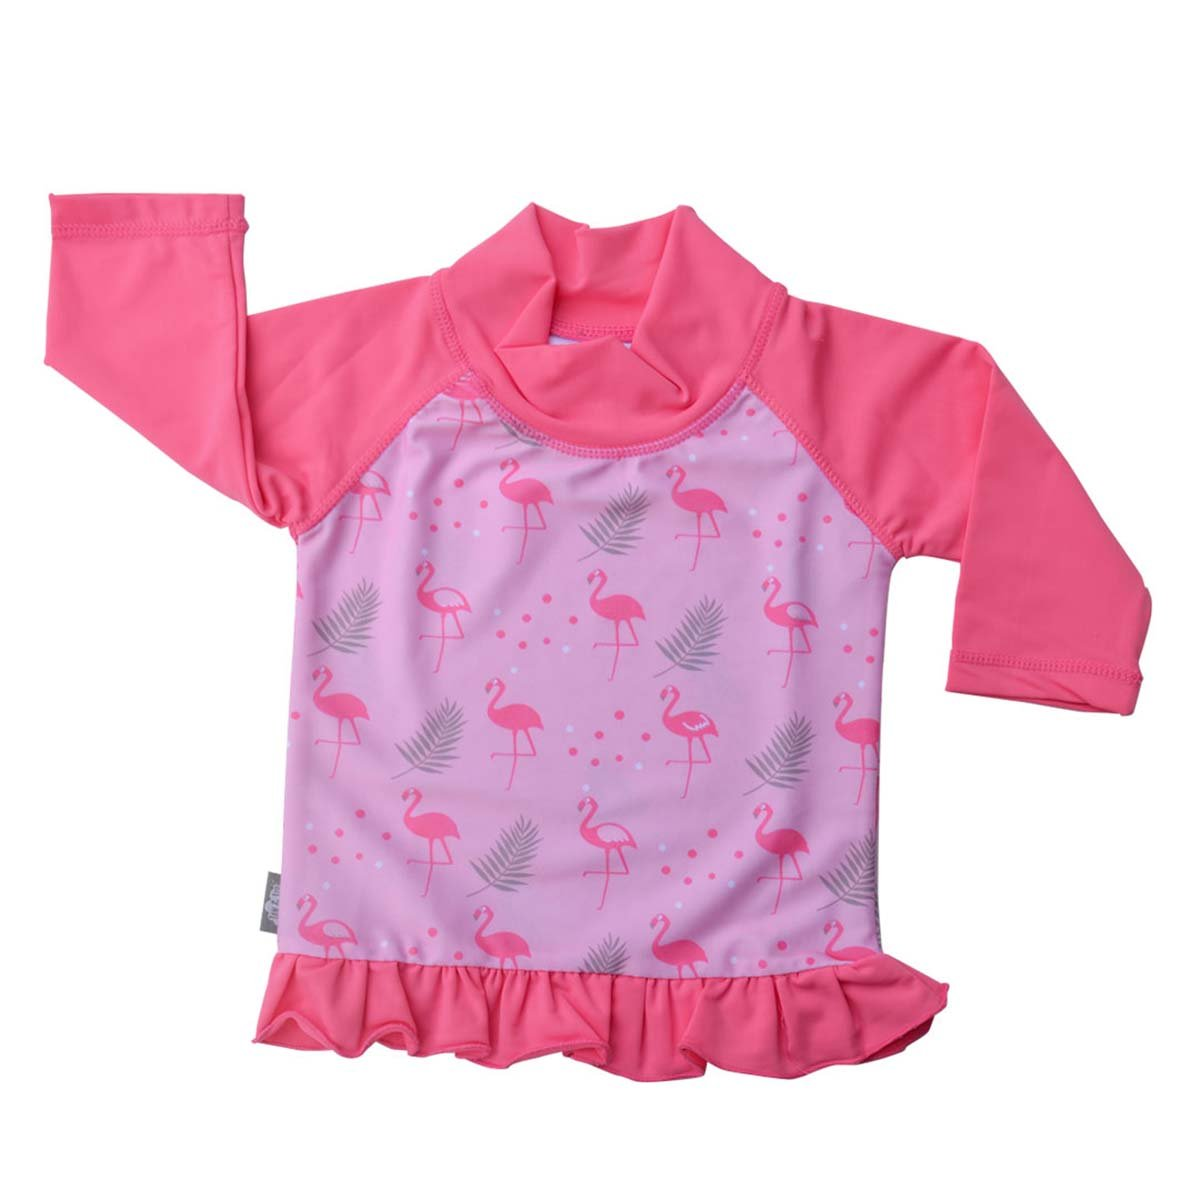 JAN & JUL UV Protective Swim Shirt Rash Guard 50+ UPFBaby Girl (UV Shirt S: 0-6m, Flamingo) Twinklebelle Design Inc 21-07S